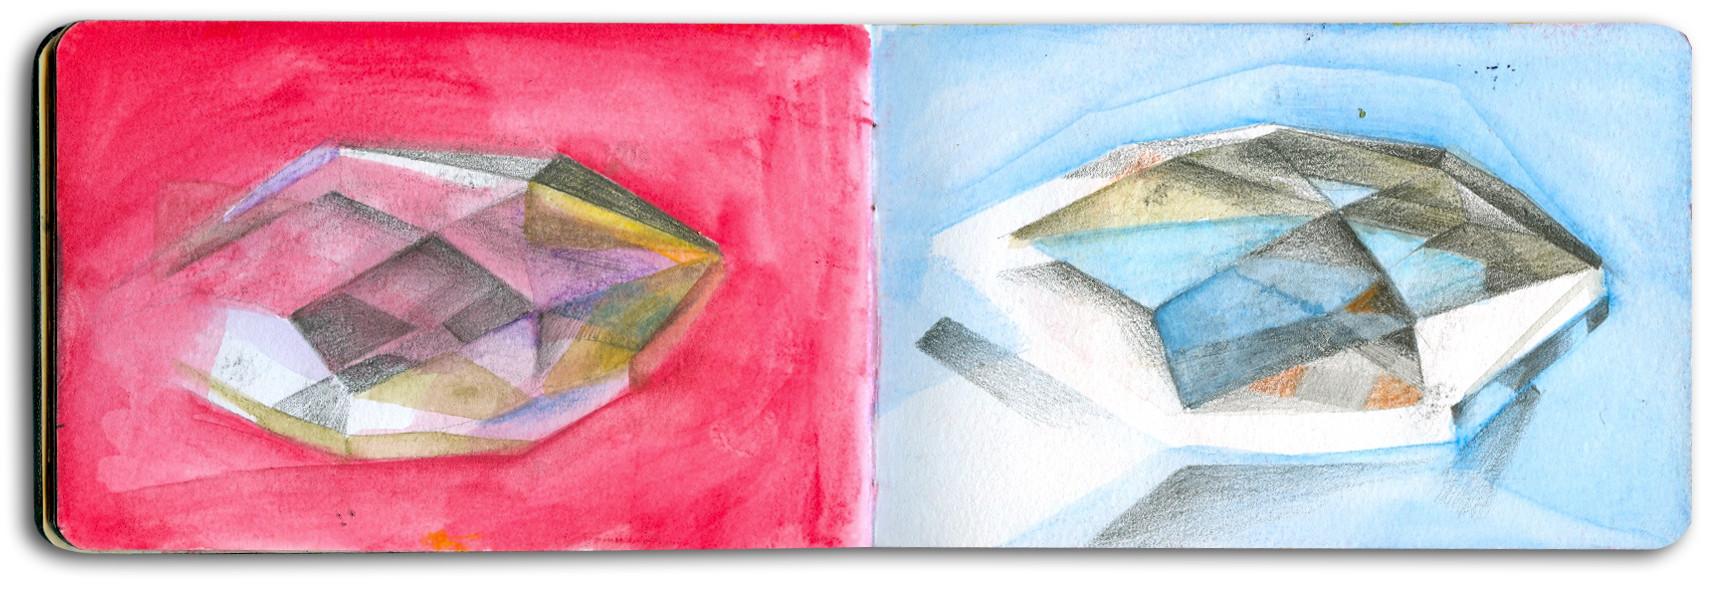 sketchbook small 2011/06